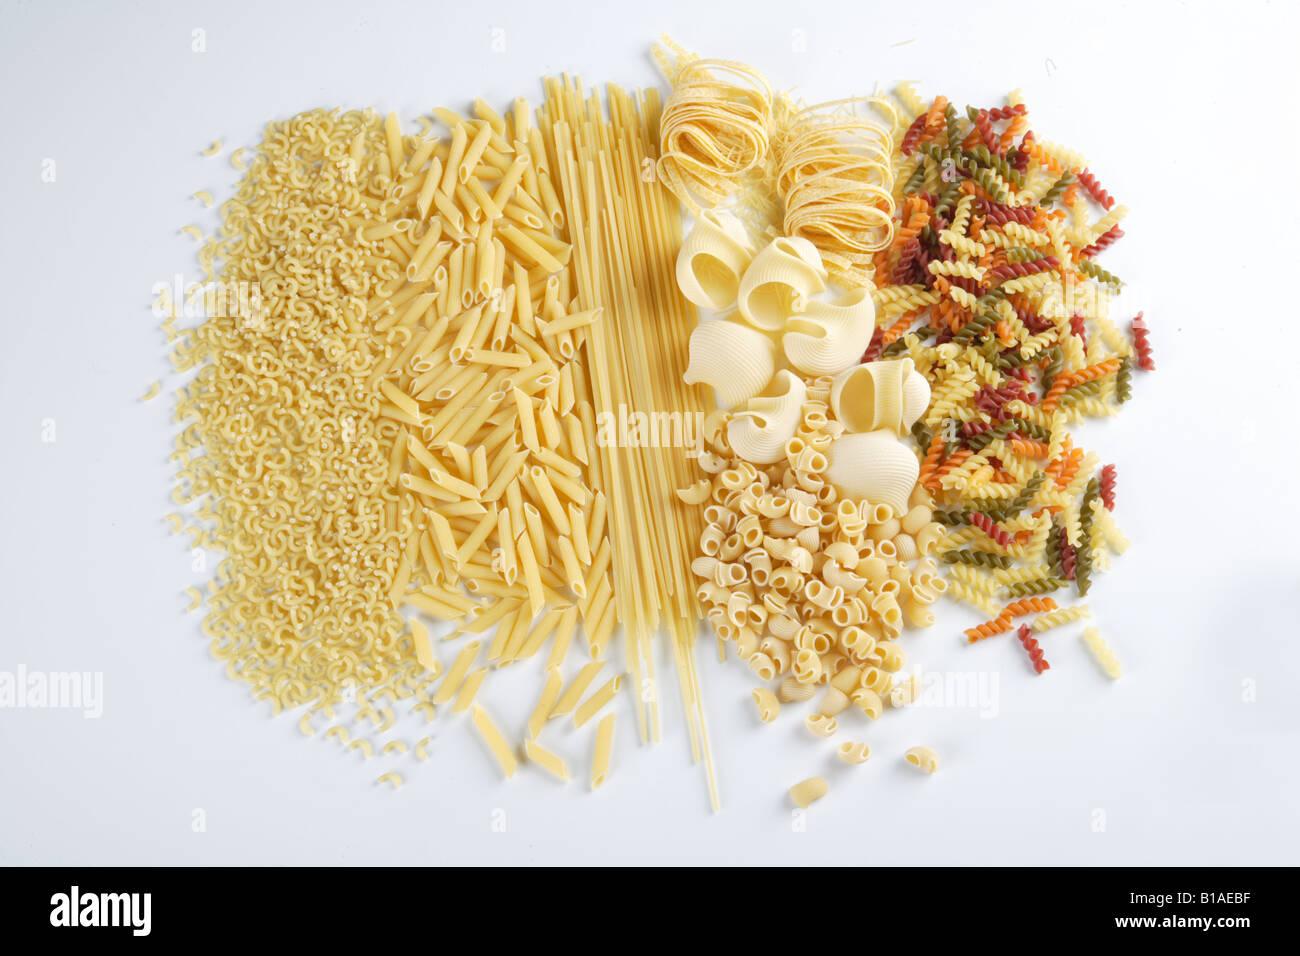 Still lifes of pasta (zhenital) - Stock Image